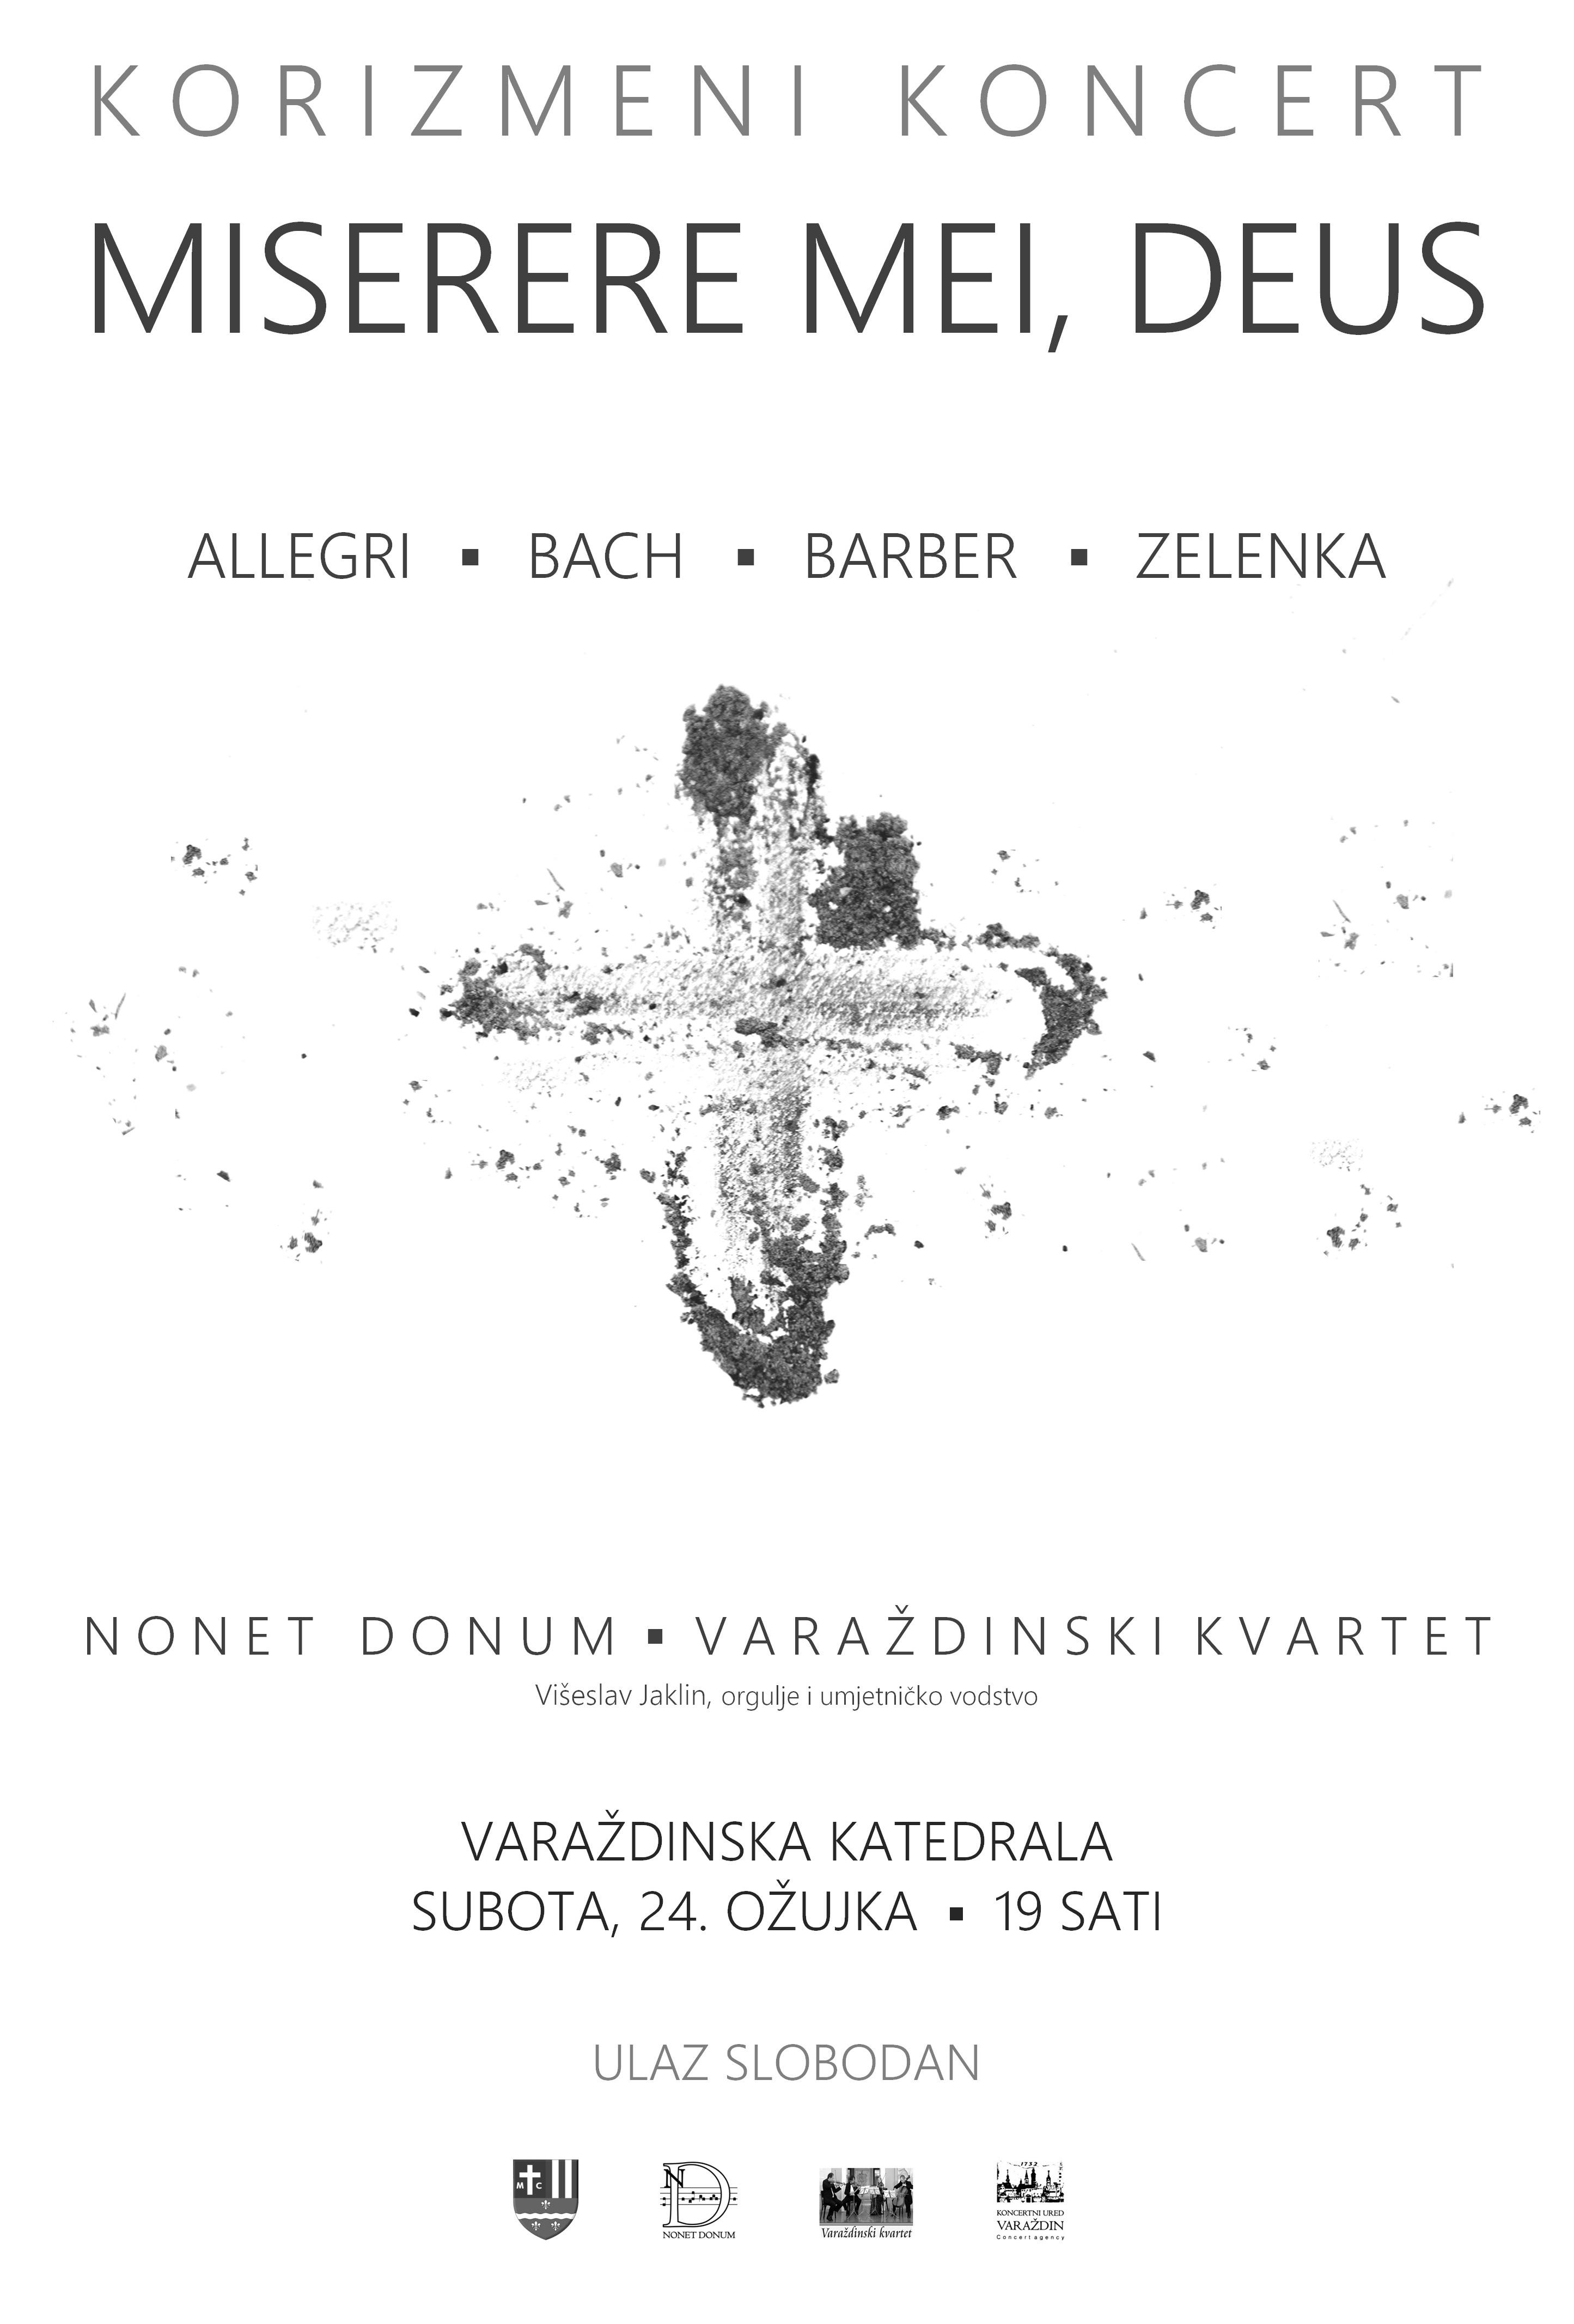 Korizmeni koncert 2018